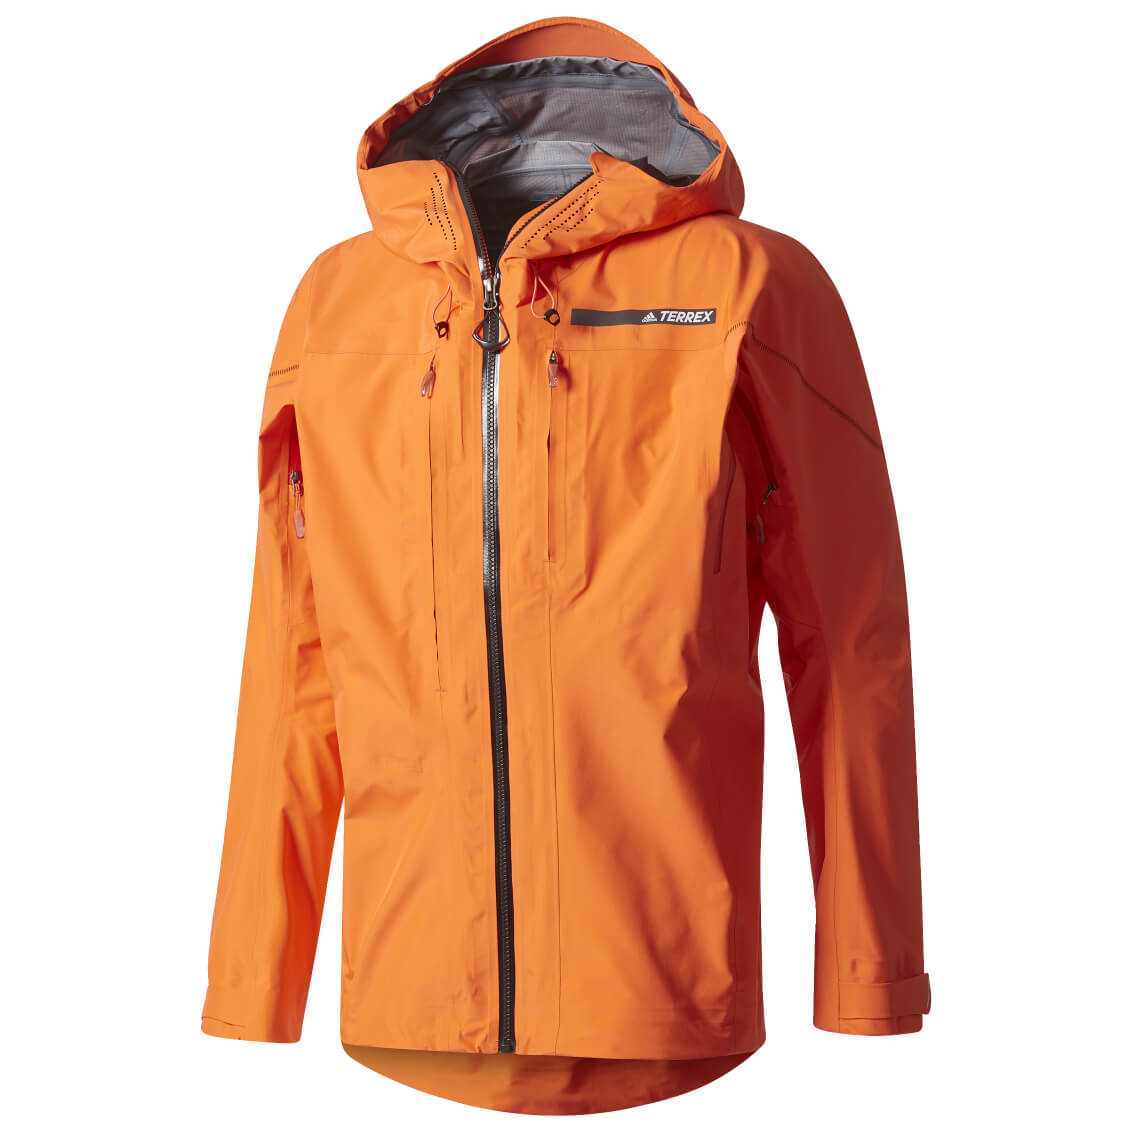 Adidas Terrex Techrock GTX Hooded Jacket Veste hardshell